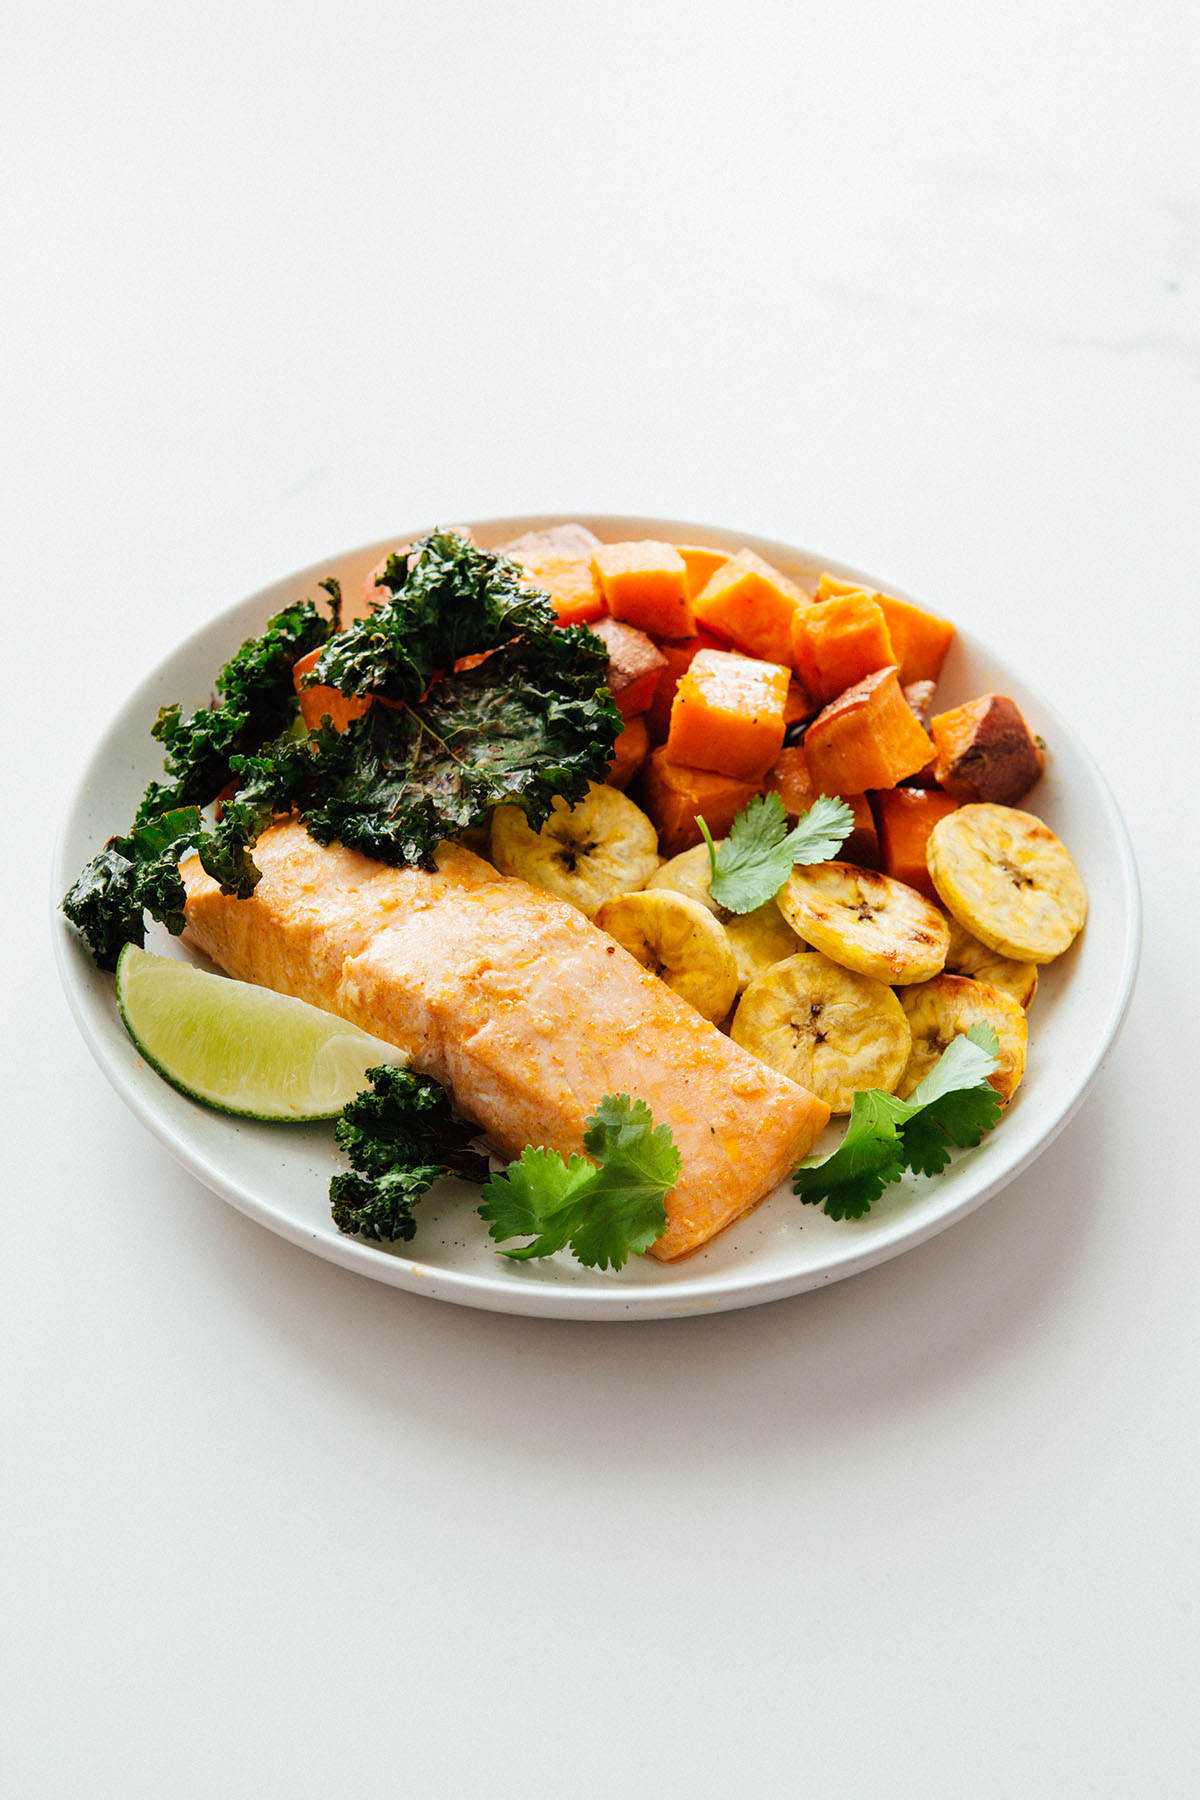 Salmon dinner on a plate.